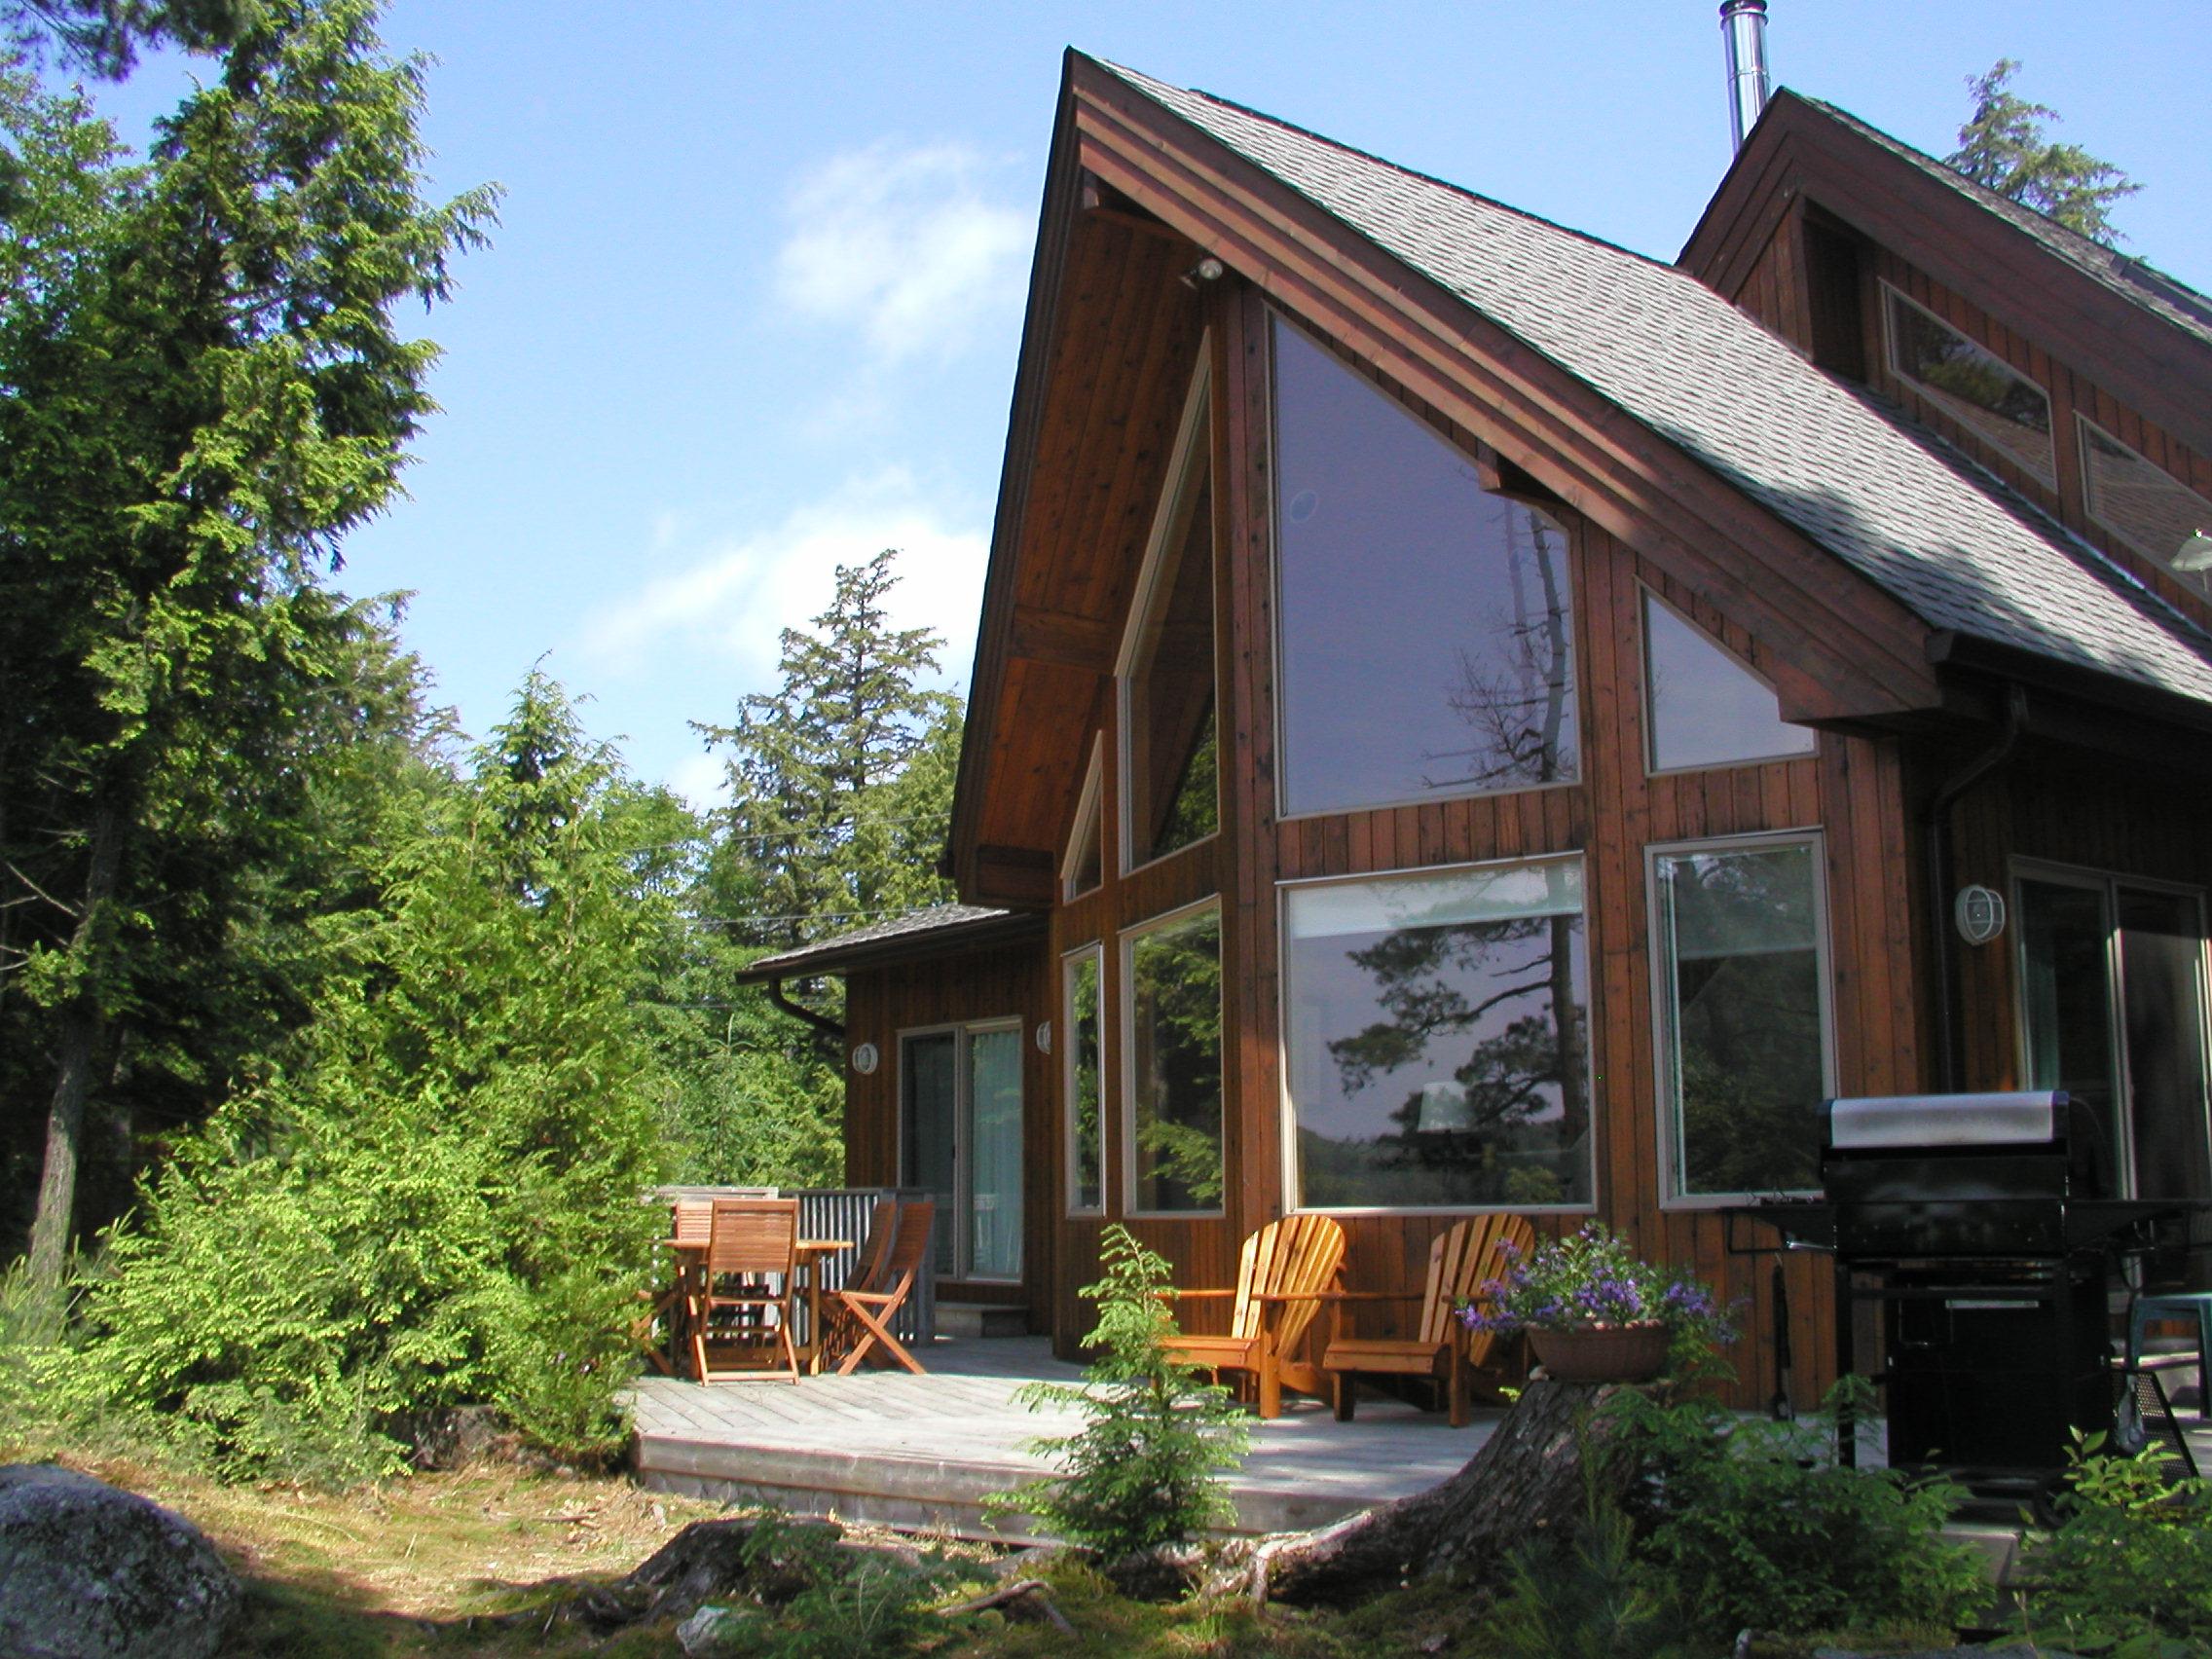 rentals lake of terra watch bays rental cinque muskoka cottage vacation